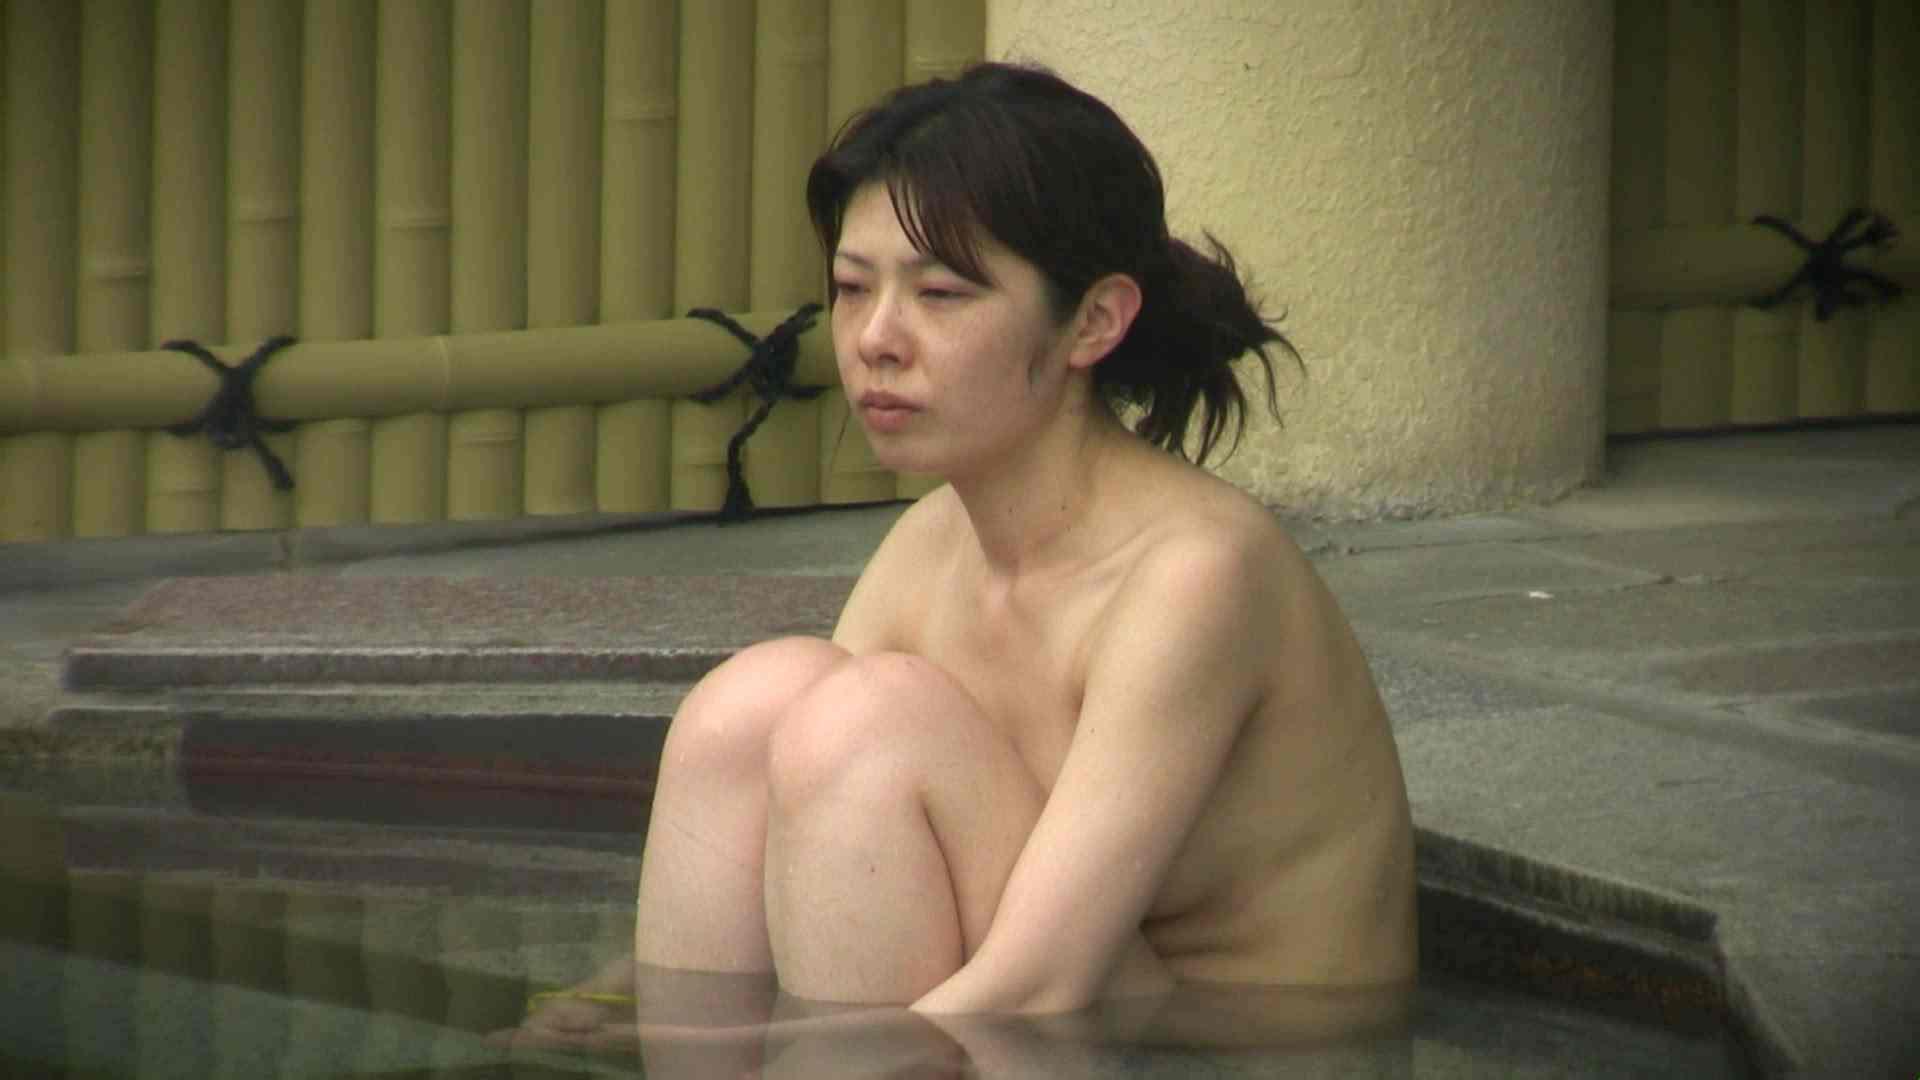 Aquaな露天風呂Vol.676 盗撮シリーズ | 露天風呂編  83PIX 57